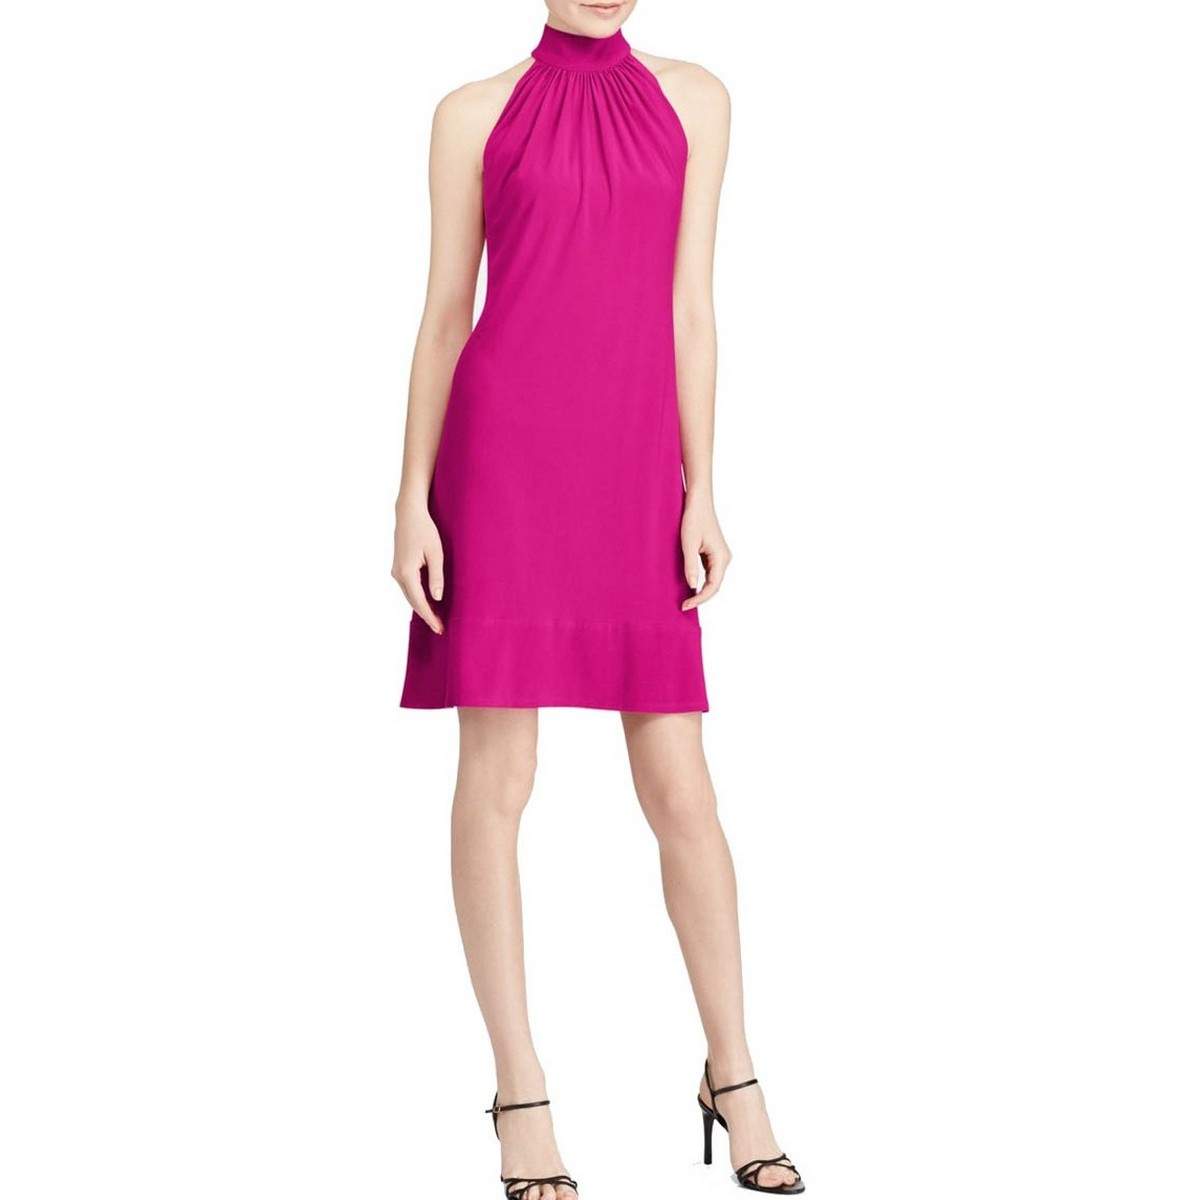 93f1782920 Details about AMERICAN LIVING NEW Women s Pink Mock Neck Shift Dress 18 TEDO